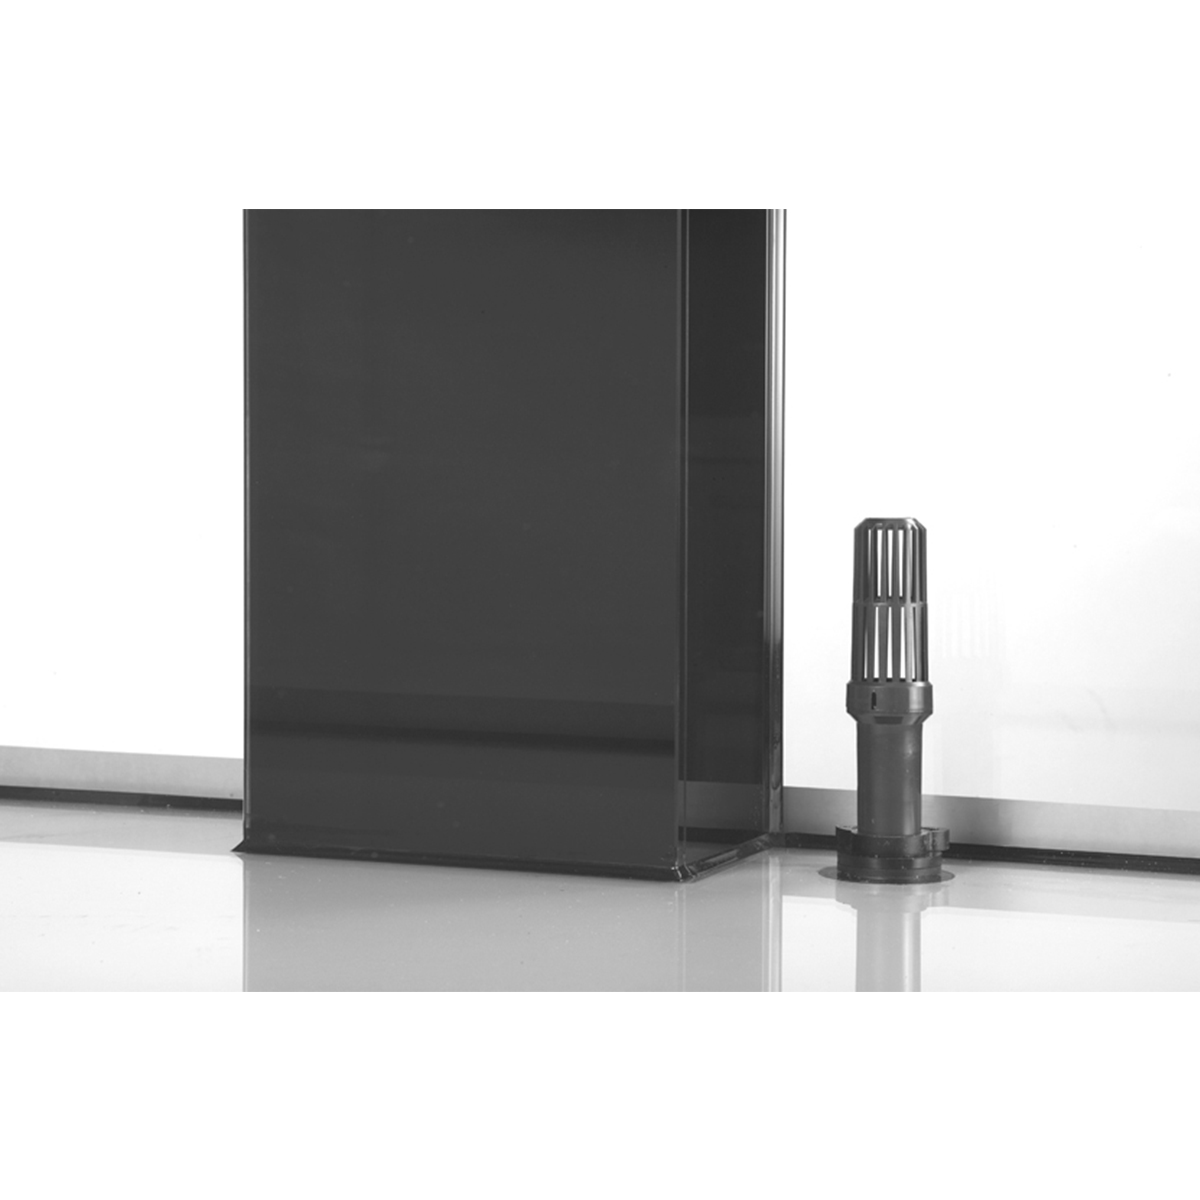 eheim incpiria 200 mit led beleuchtung kaufen bei zooroyal. Black Bedroom Furniture Sets. Home Design Ideas